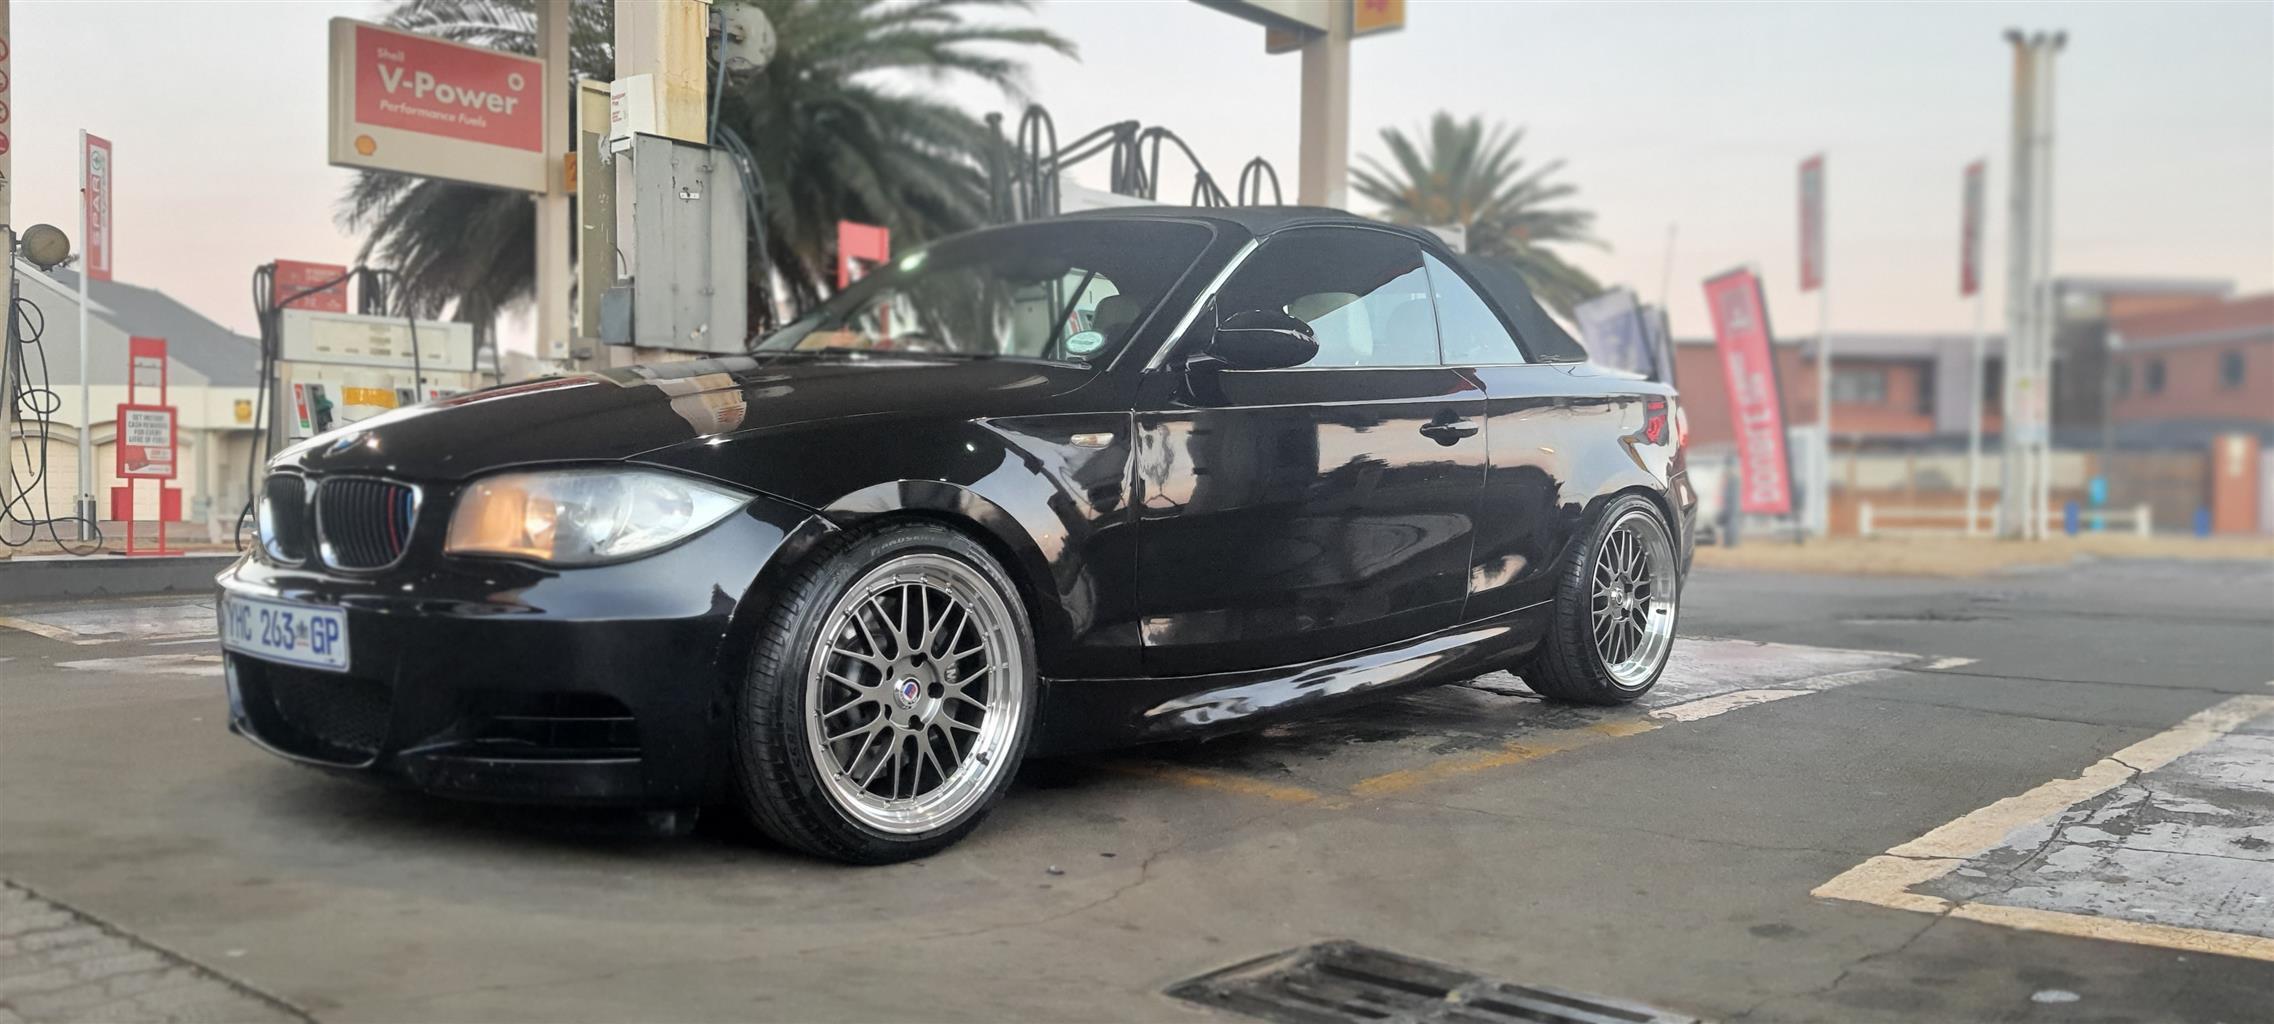 2008 BMW 1 Series 135i convertible DCT